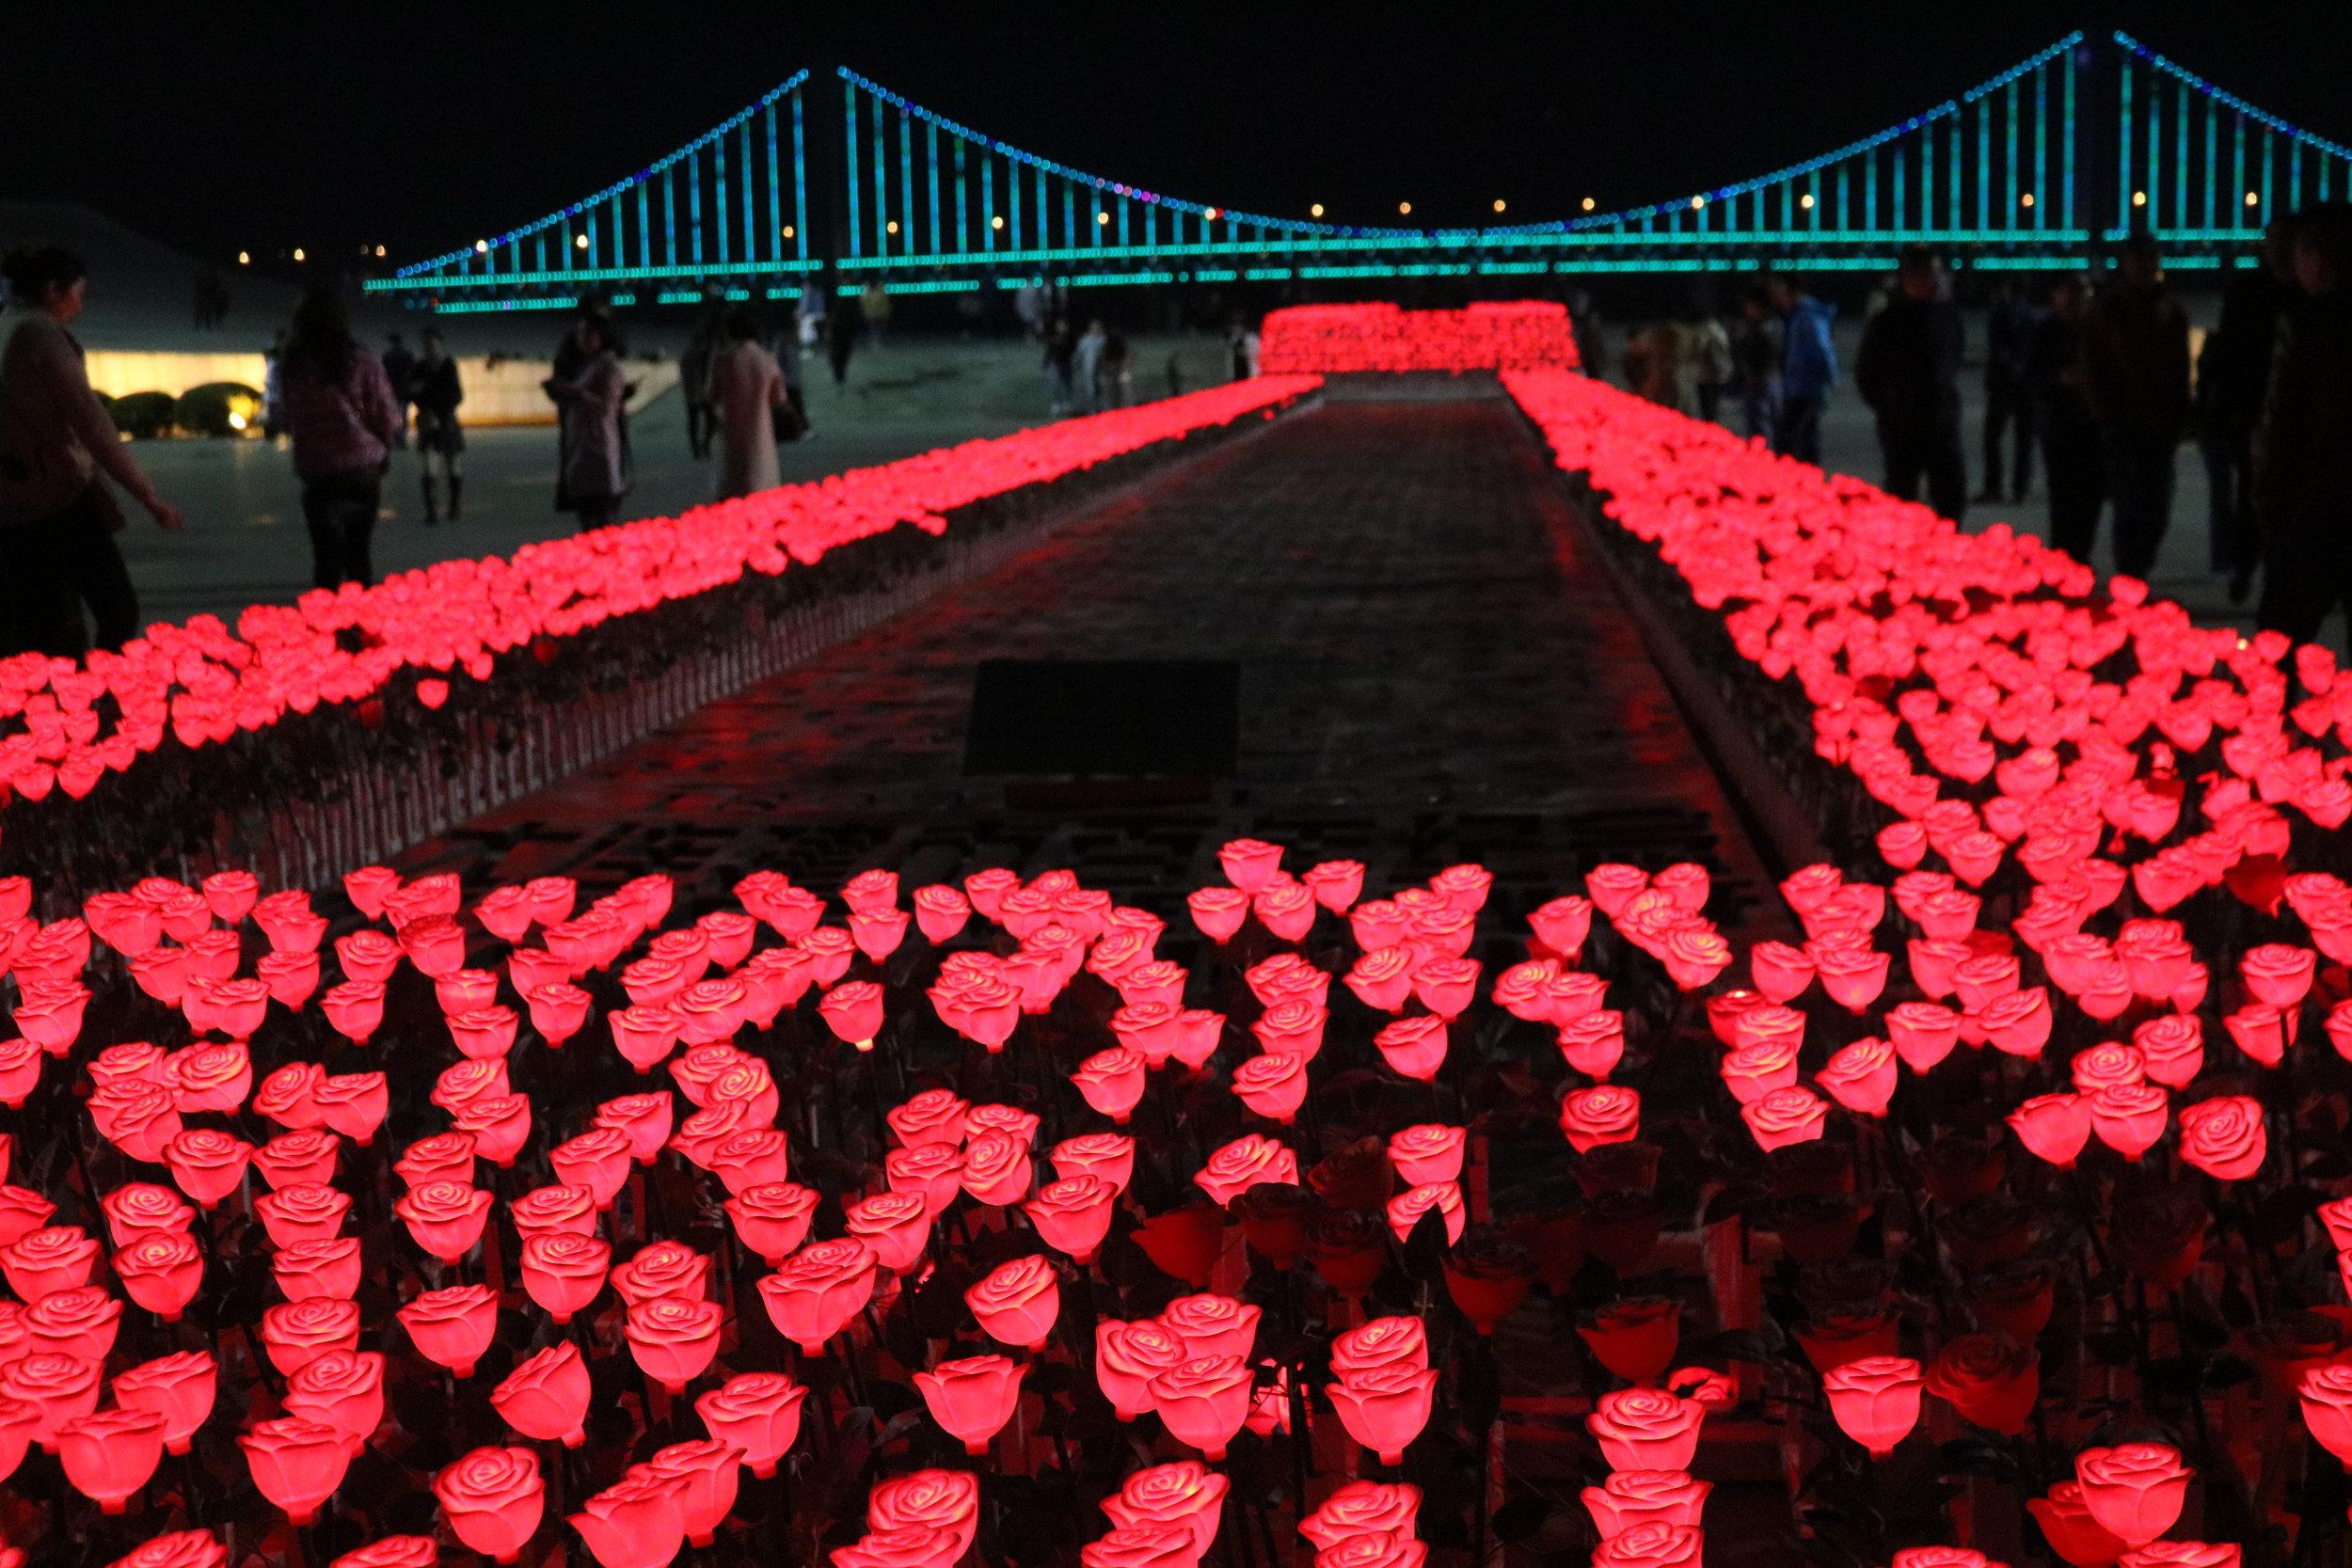 Red Roses at Xinghai Square - Dalian, China